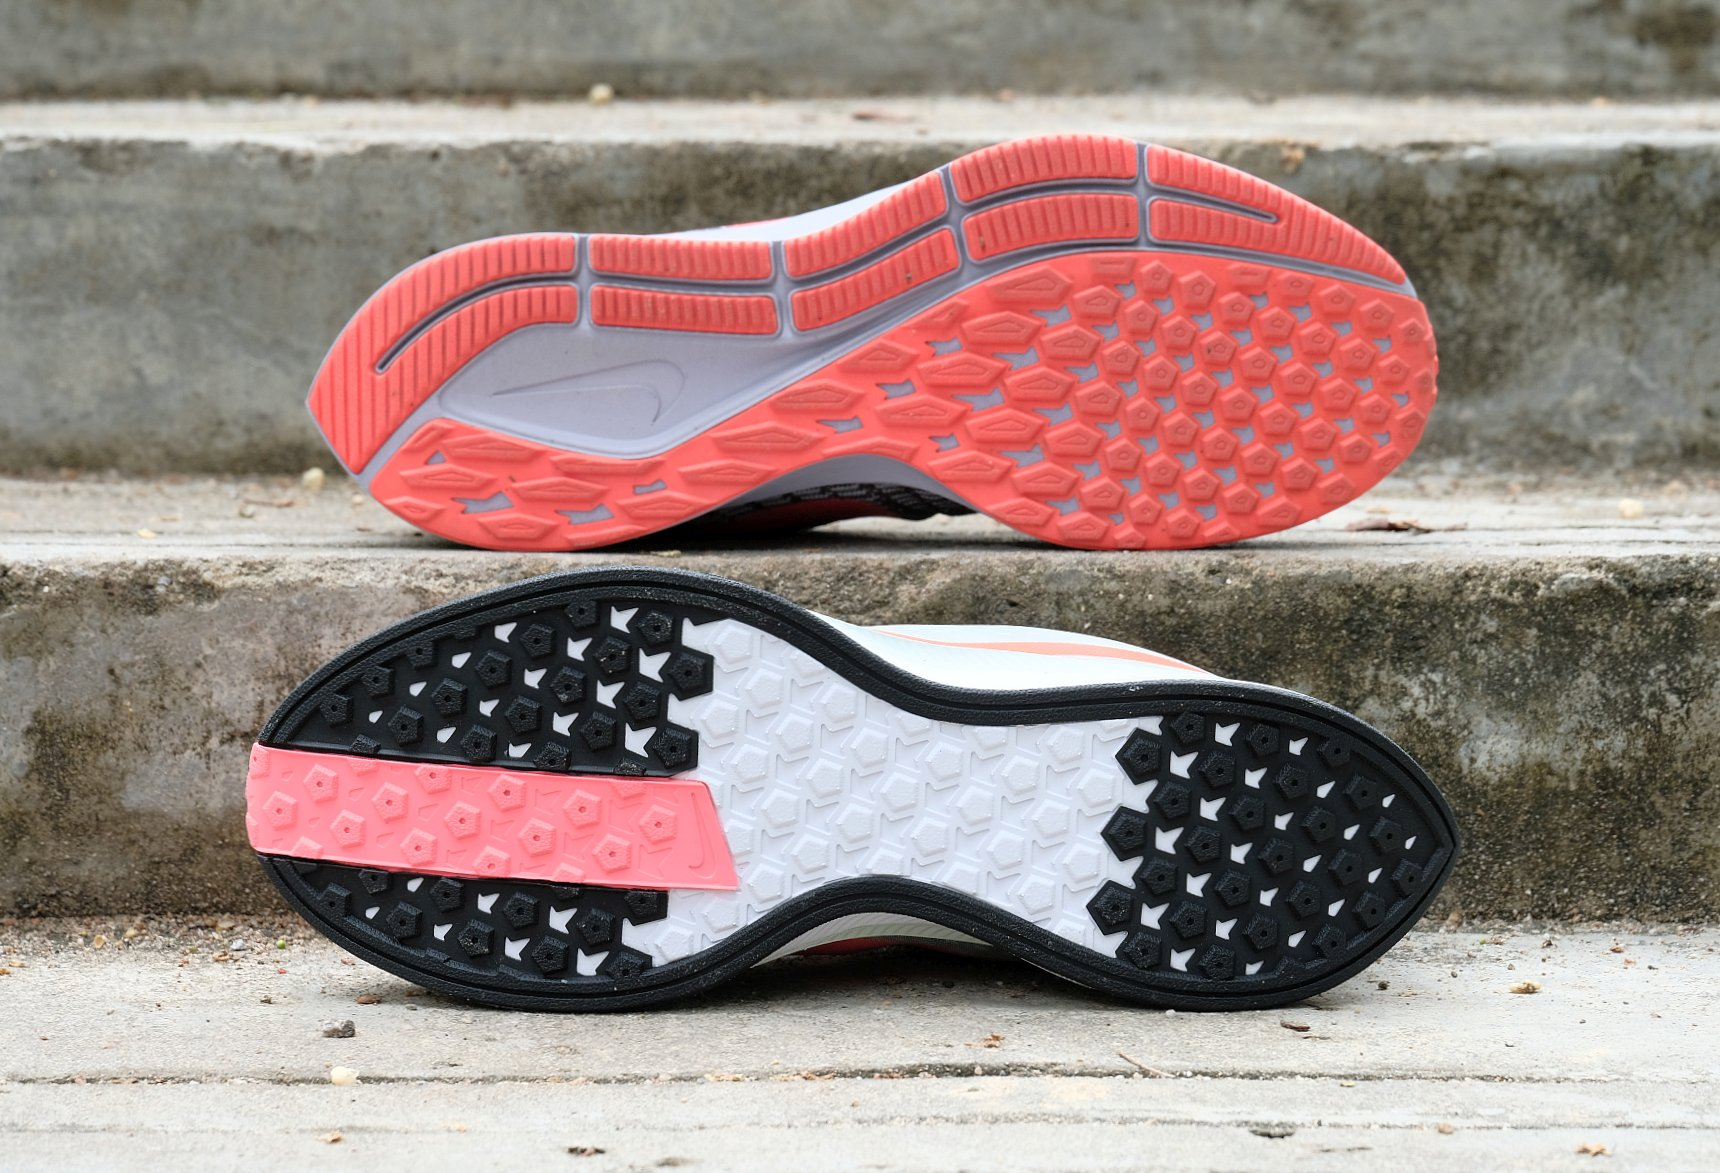 548daf2610 The Nike Air Zoom Pegasus 35 twins – RUN Singapore